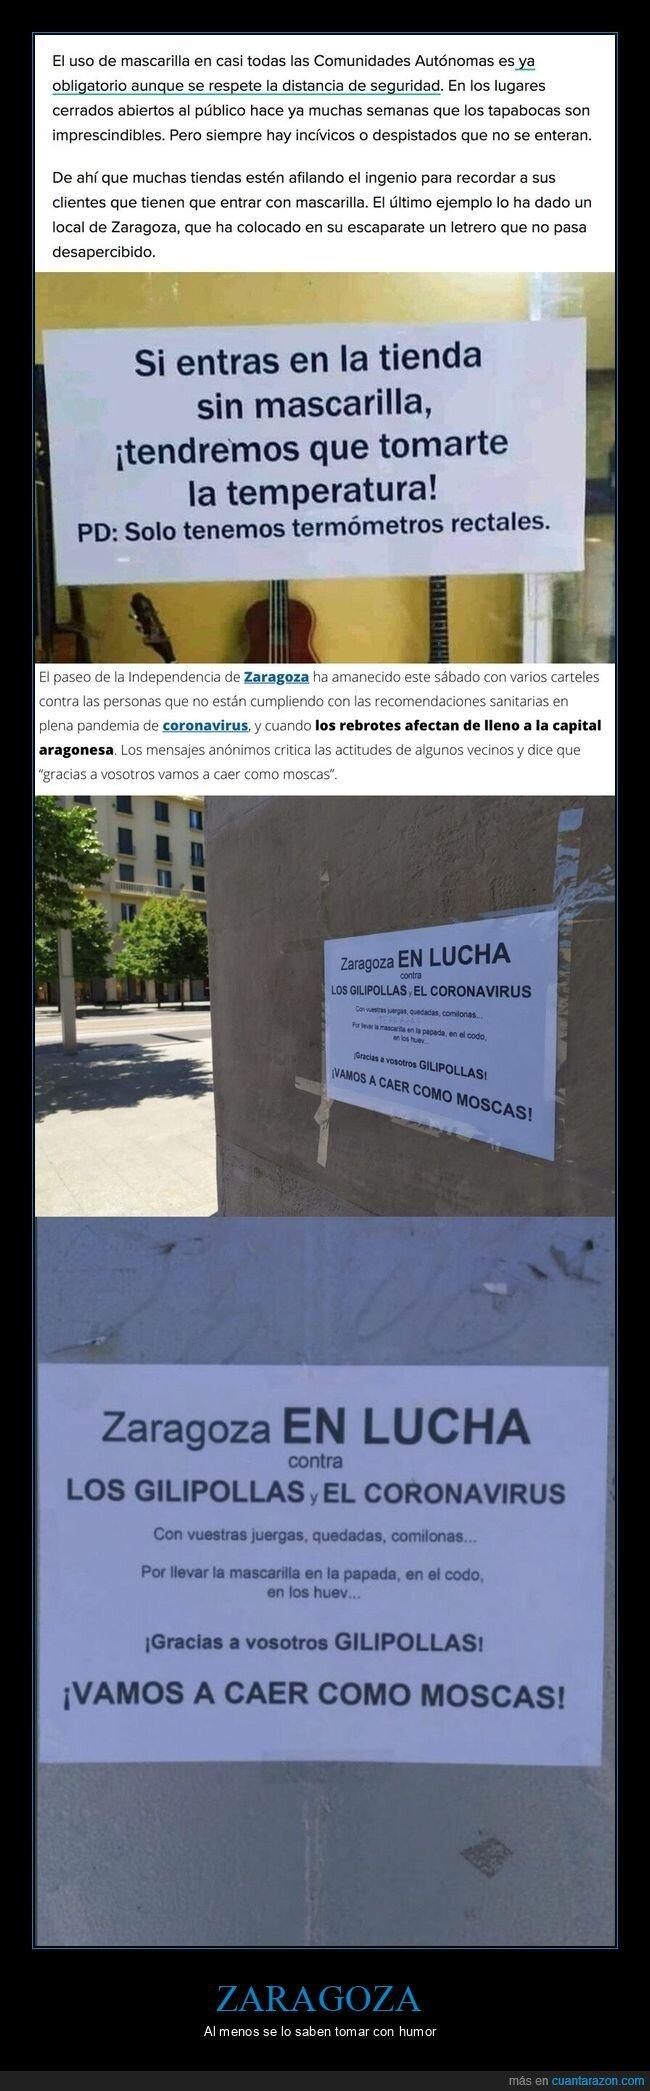 avisos,carteles,coronavirus,humor,zaragoza